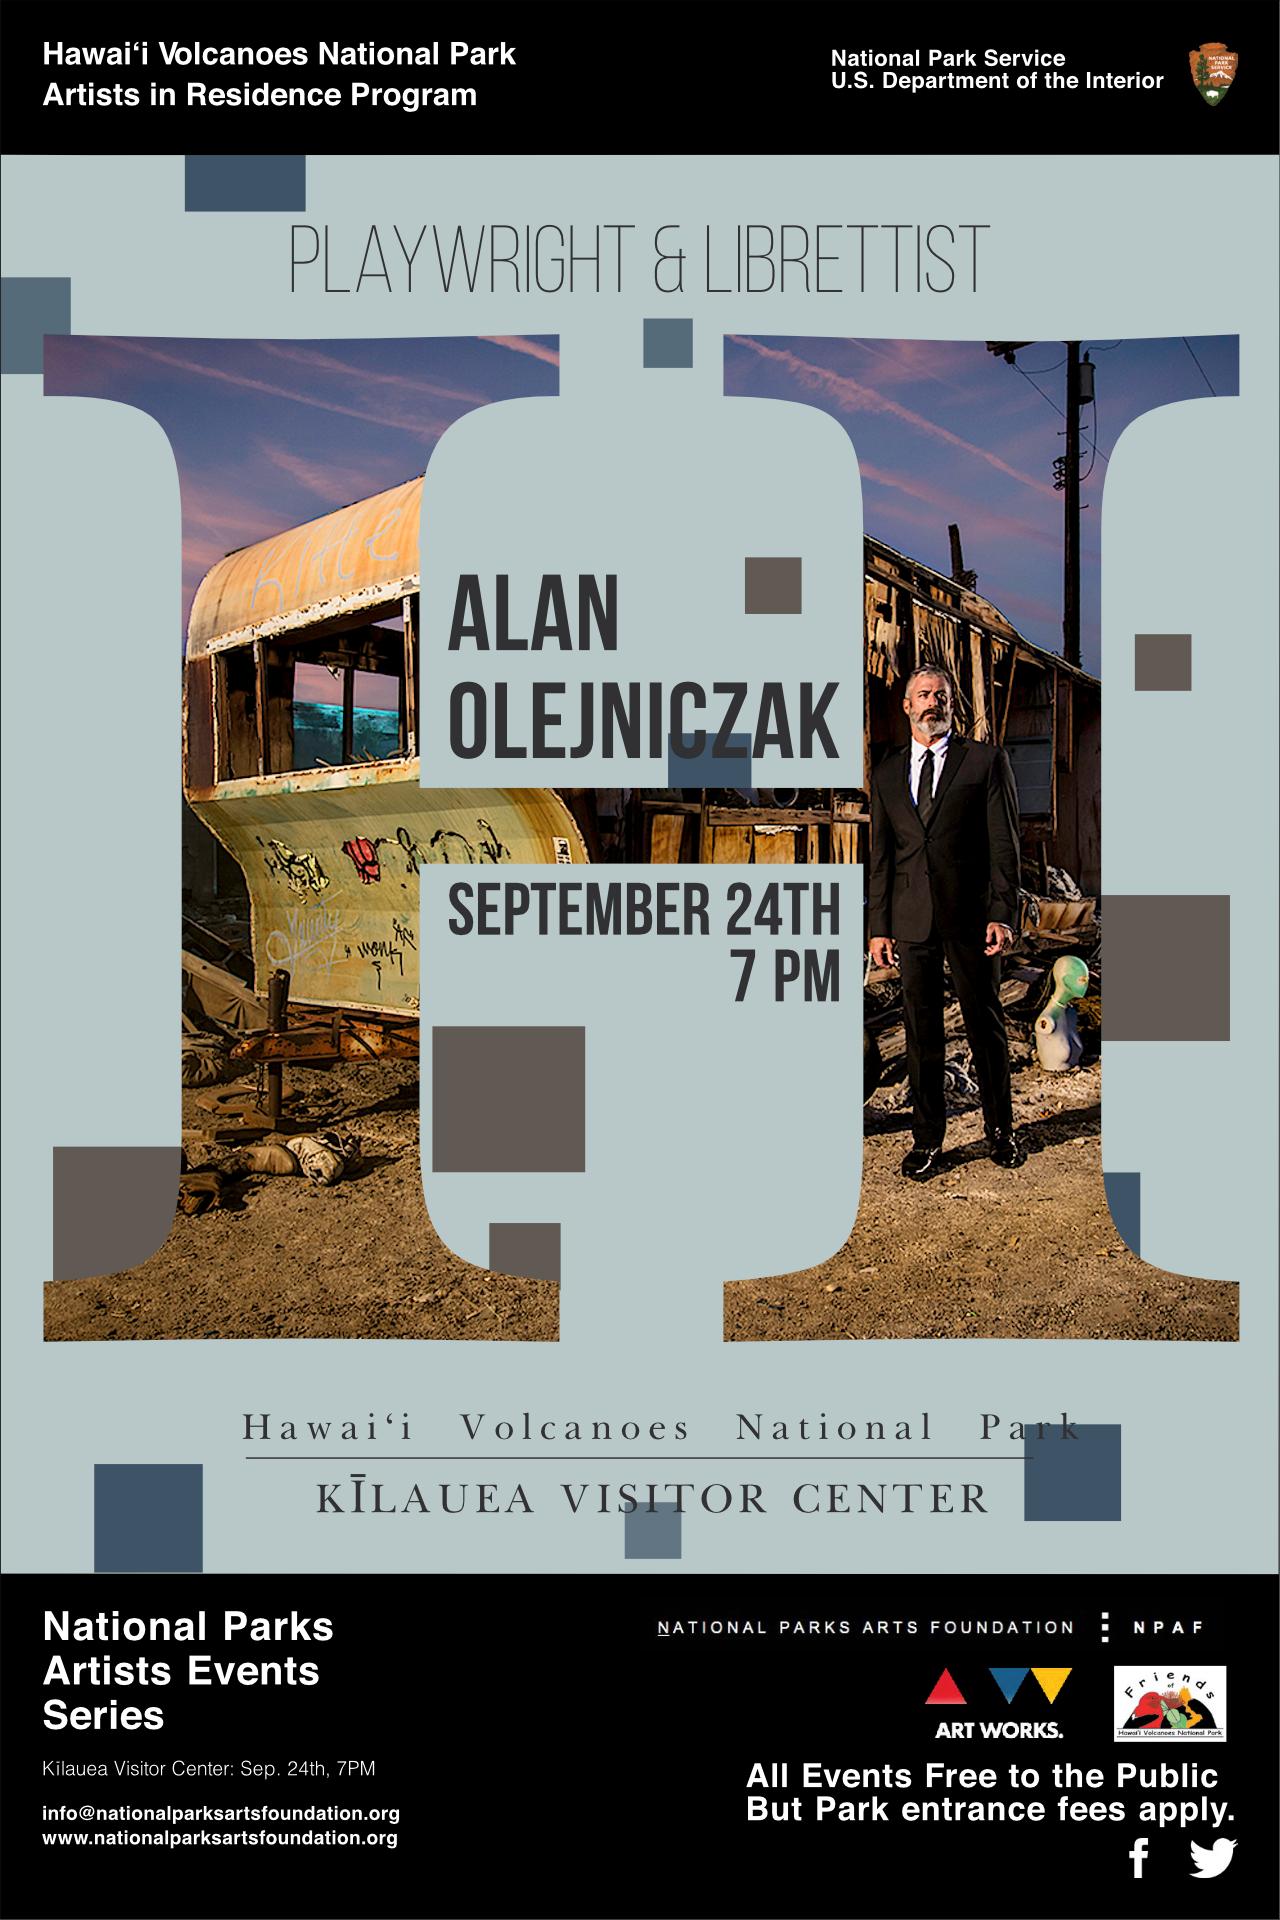 Olejniczak_poster_web